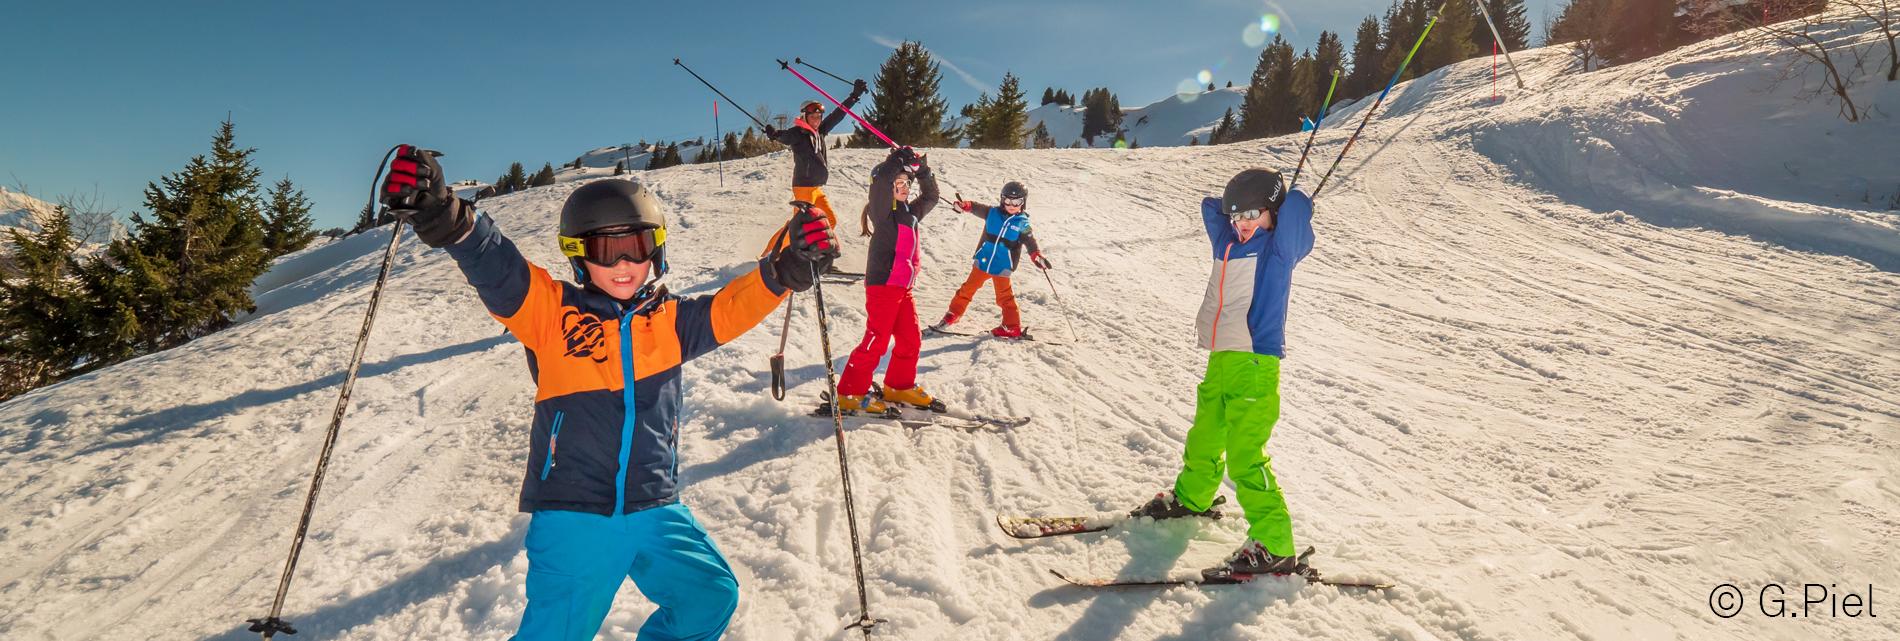 04703 20 Praz Ski de Piste ©Gilles Piel